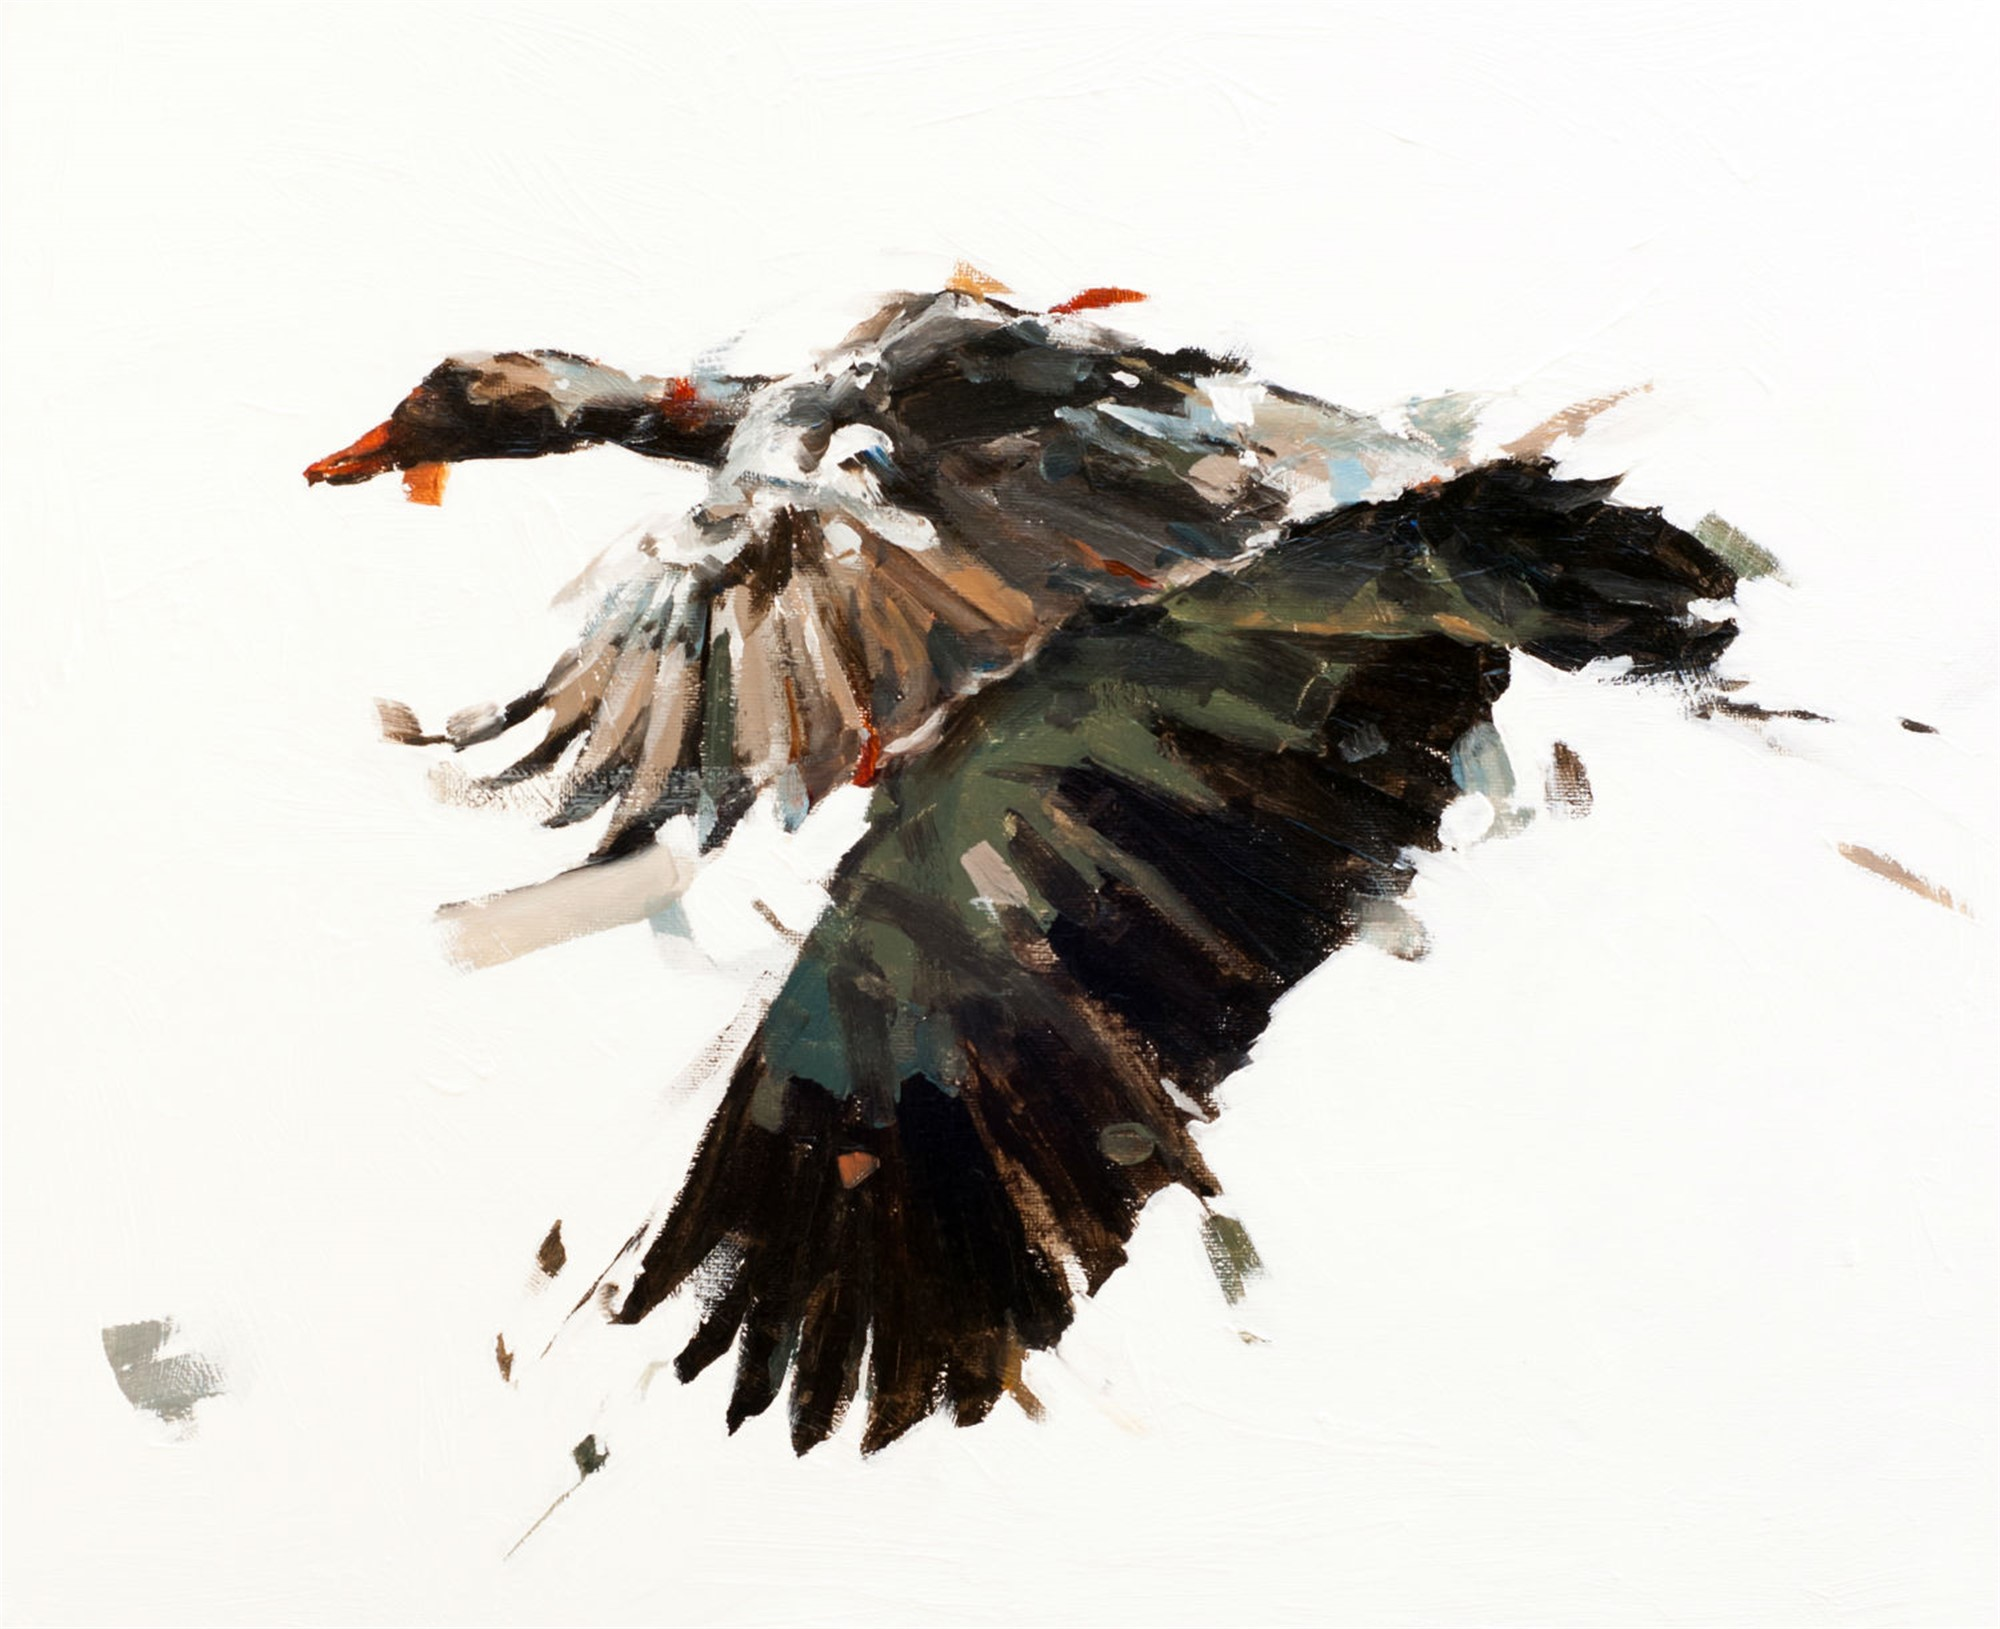 Goose II by Thibault Jandot